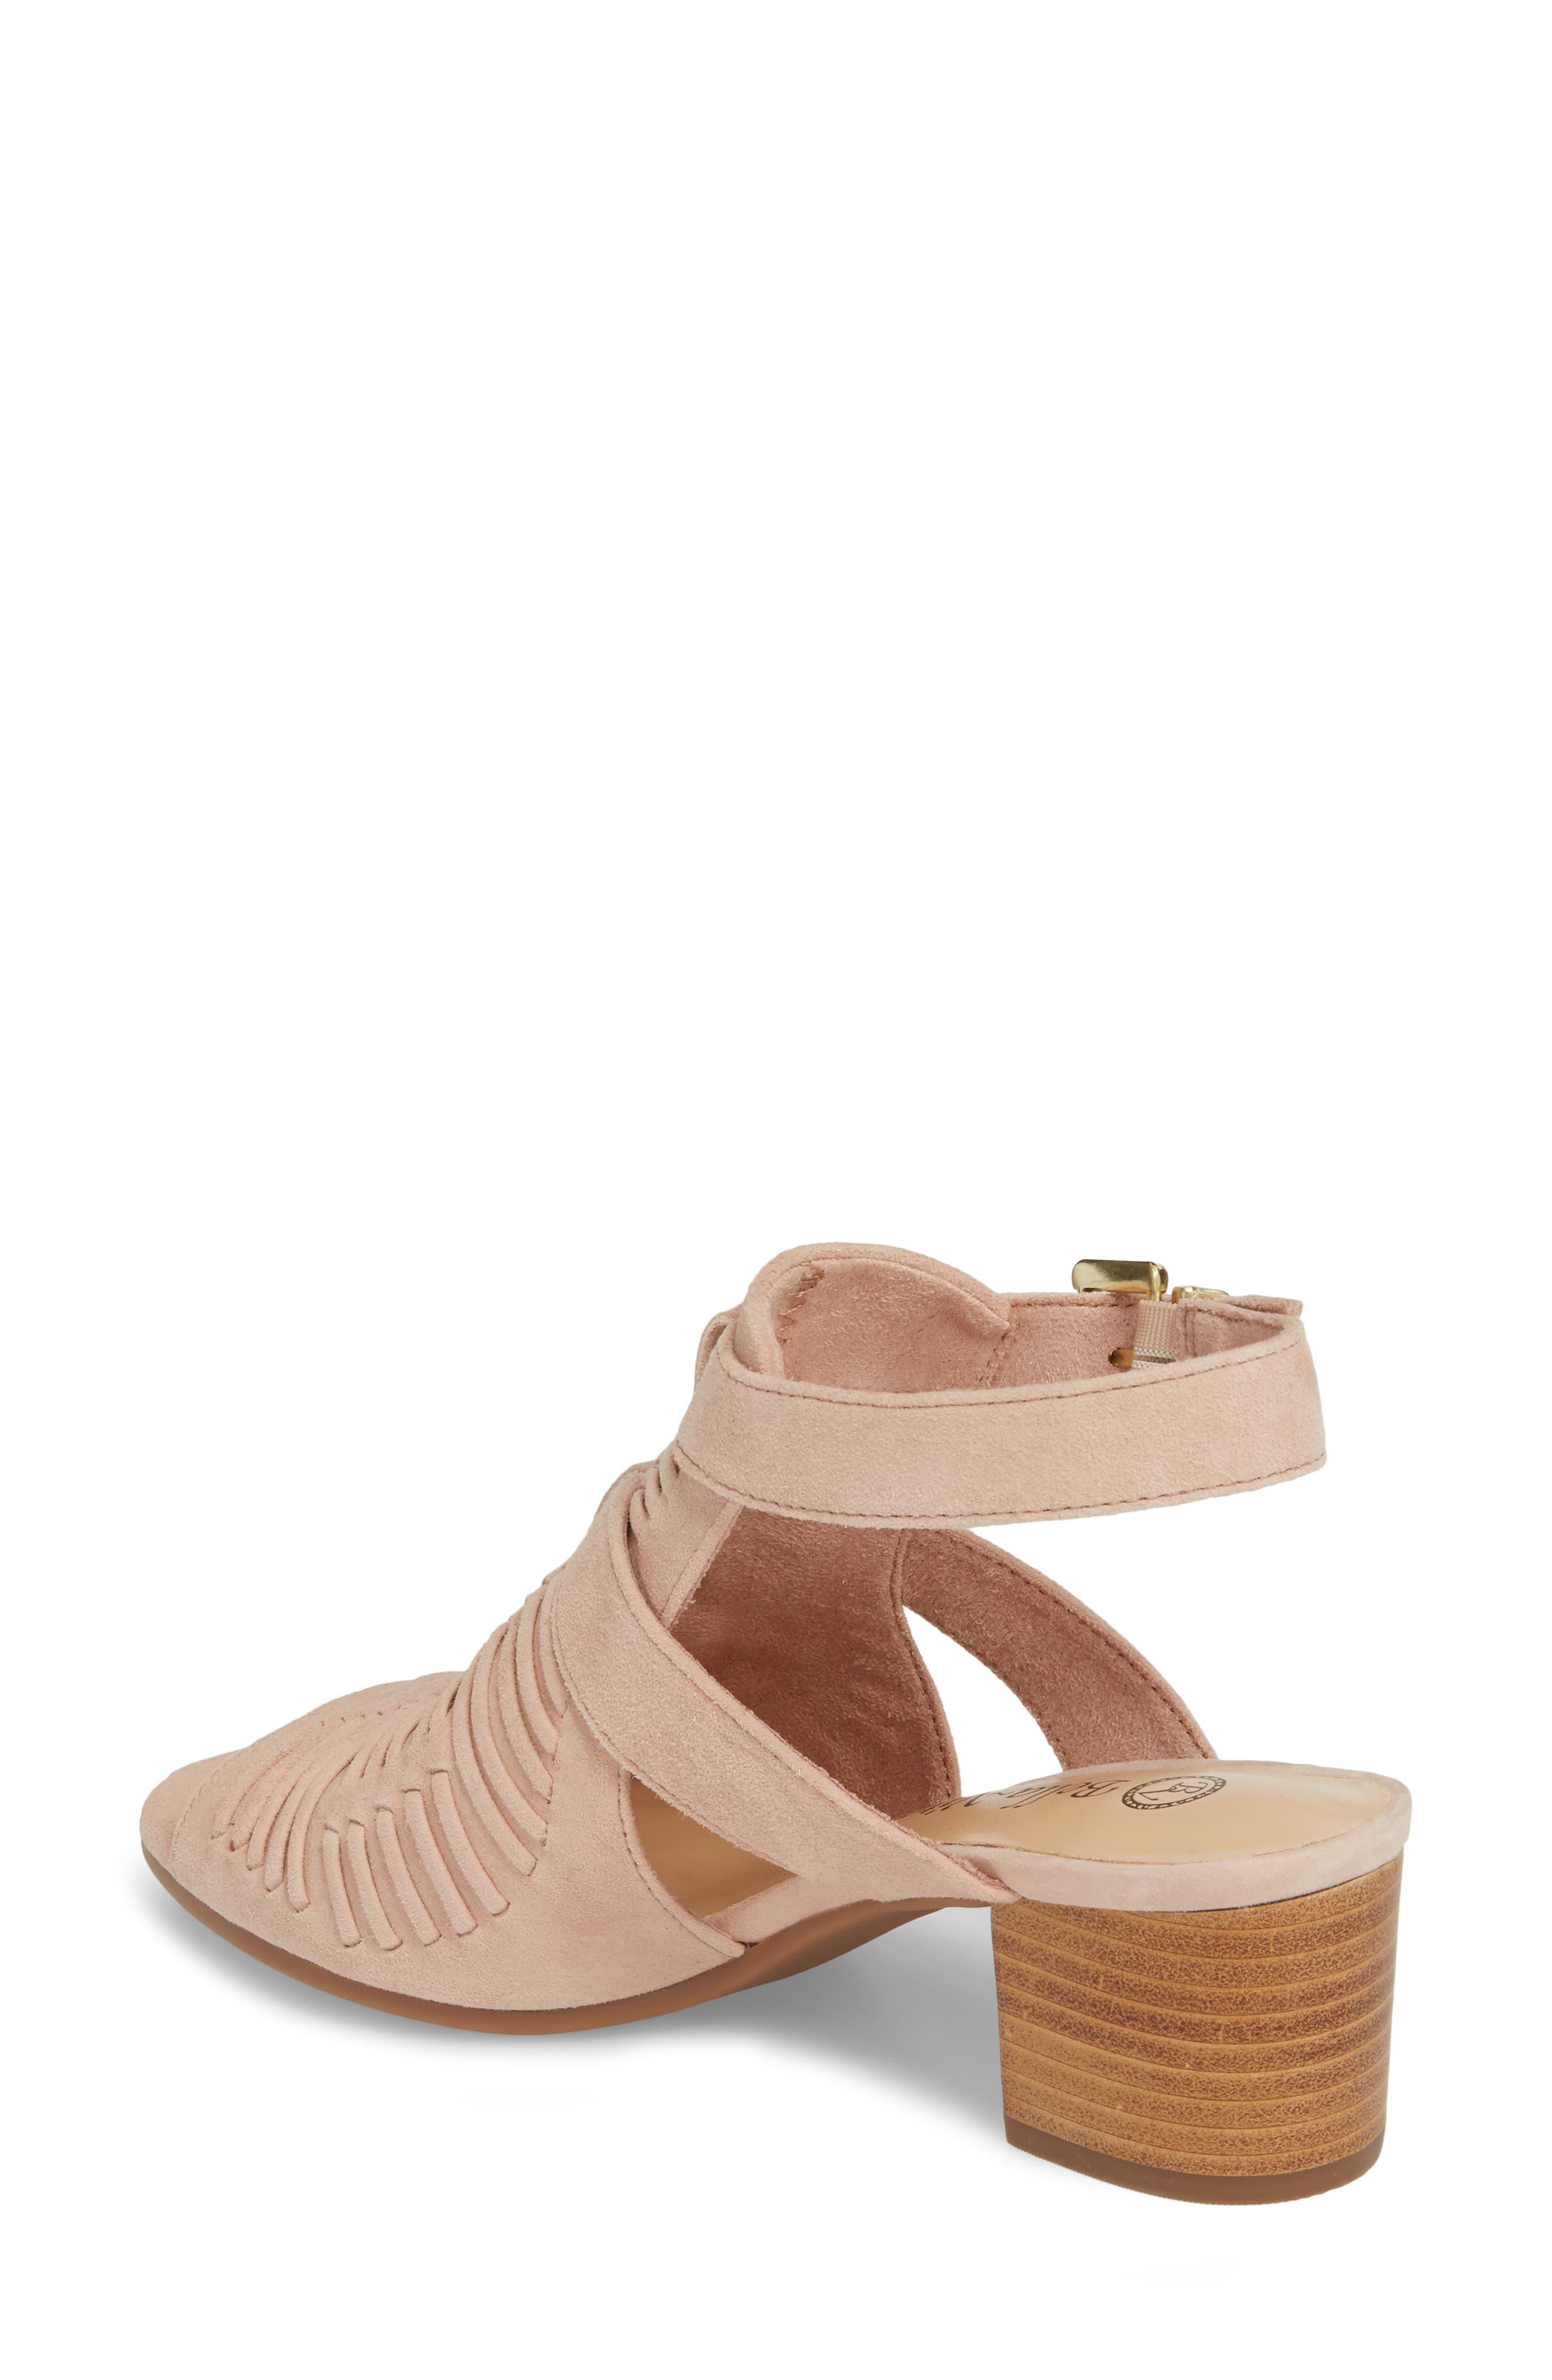 Finley Ankle Strap Sandal,                             Alternate thumbnail 10, color,